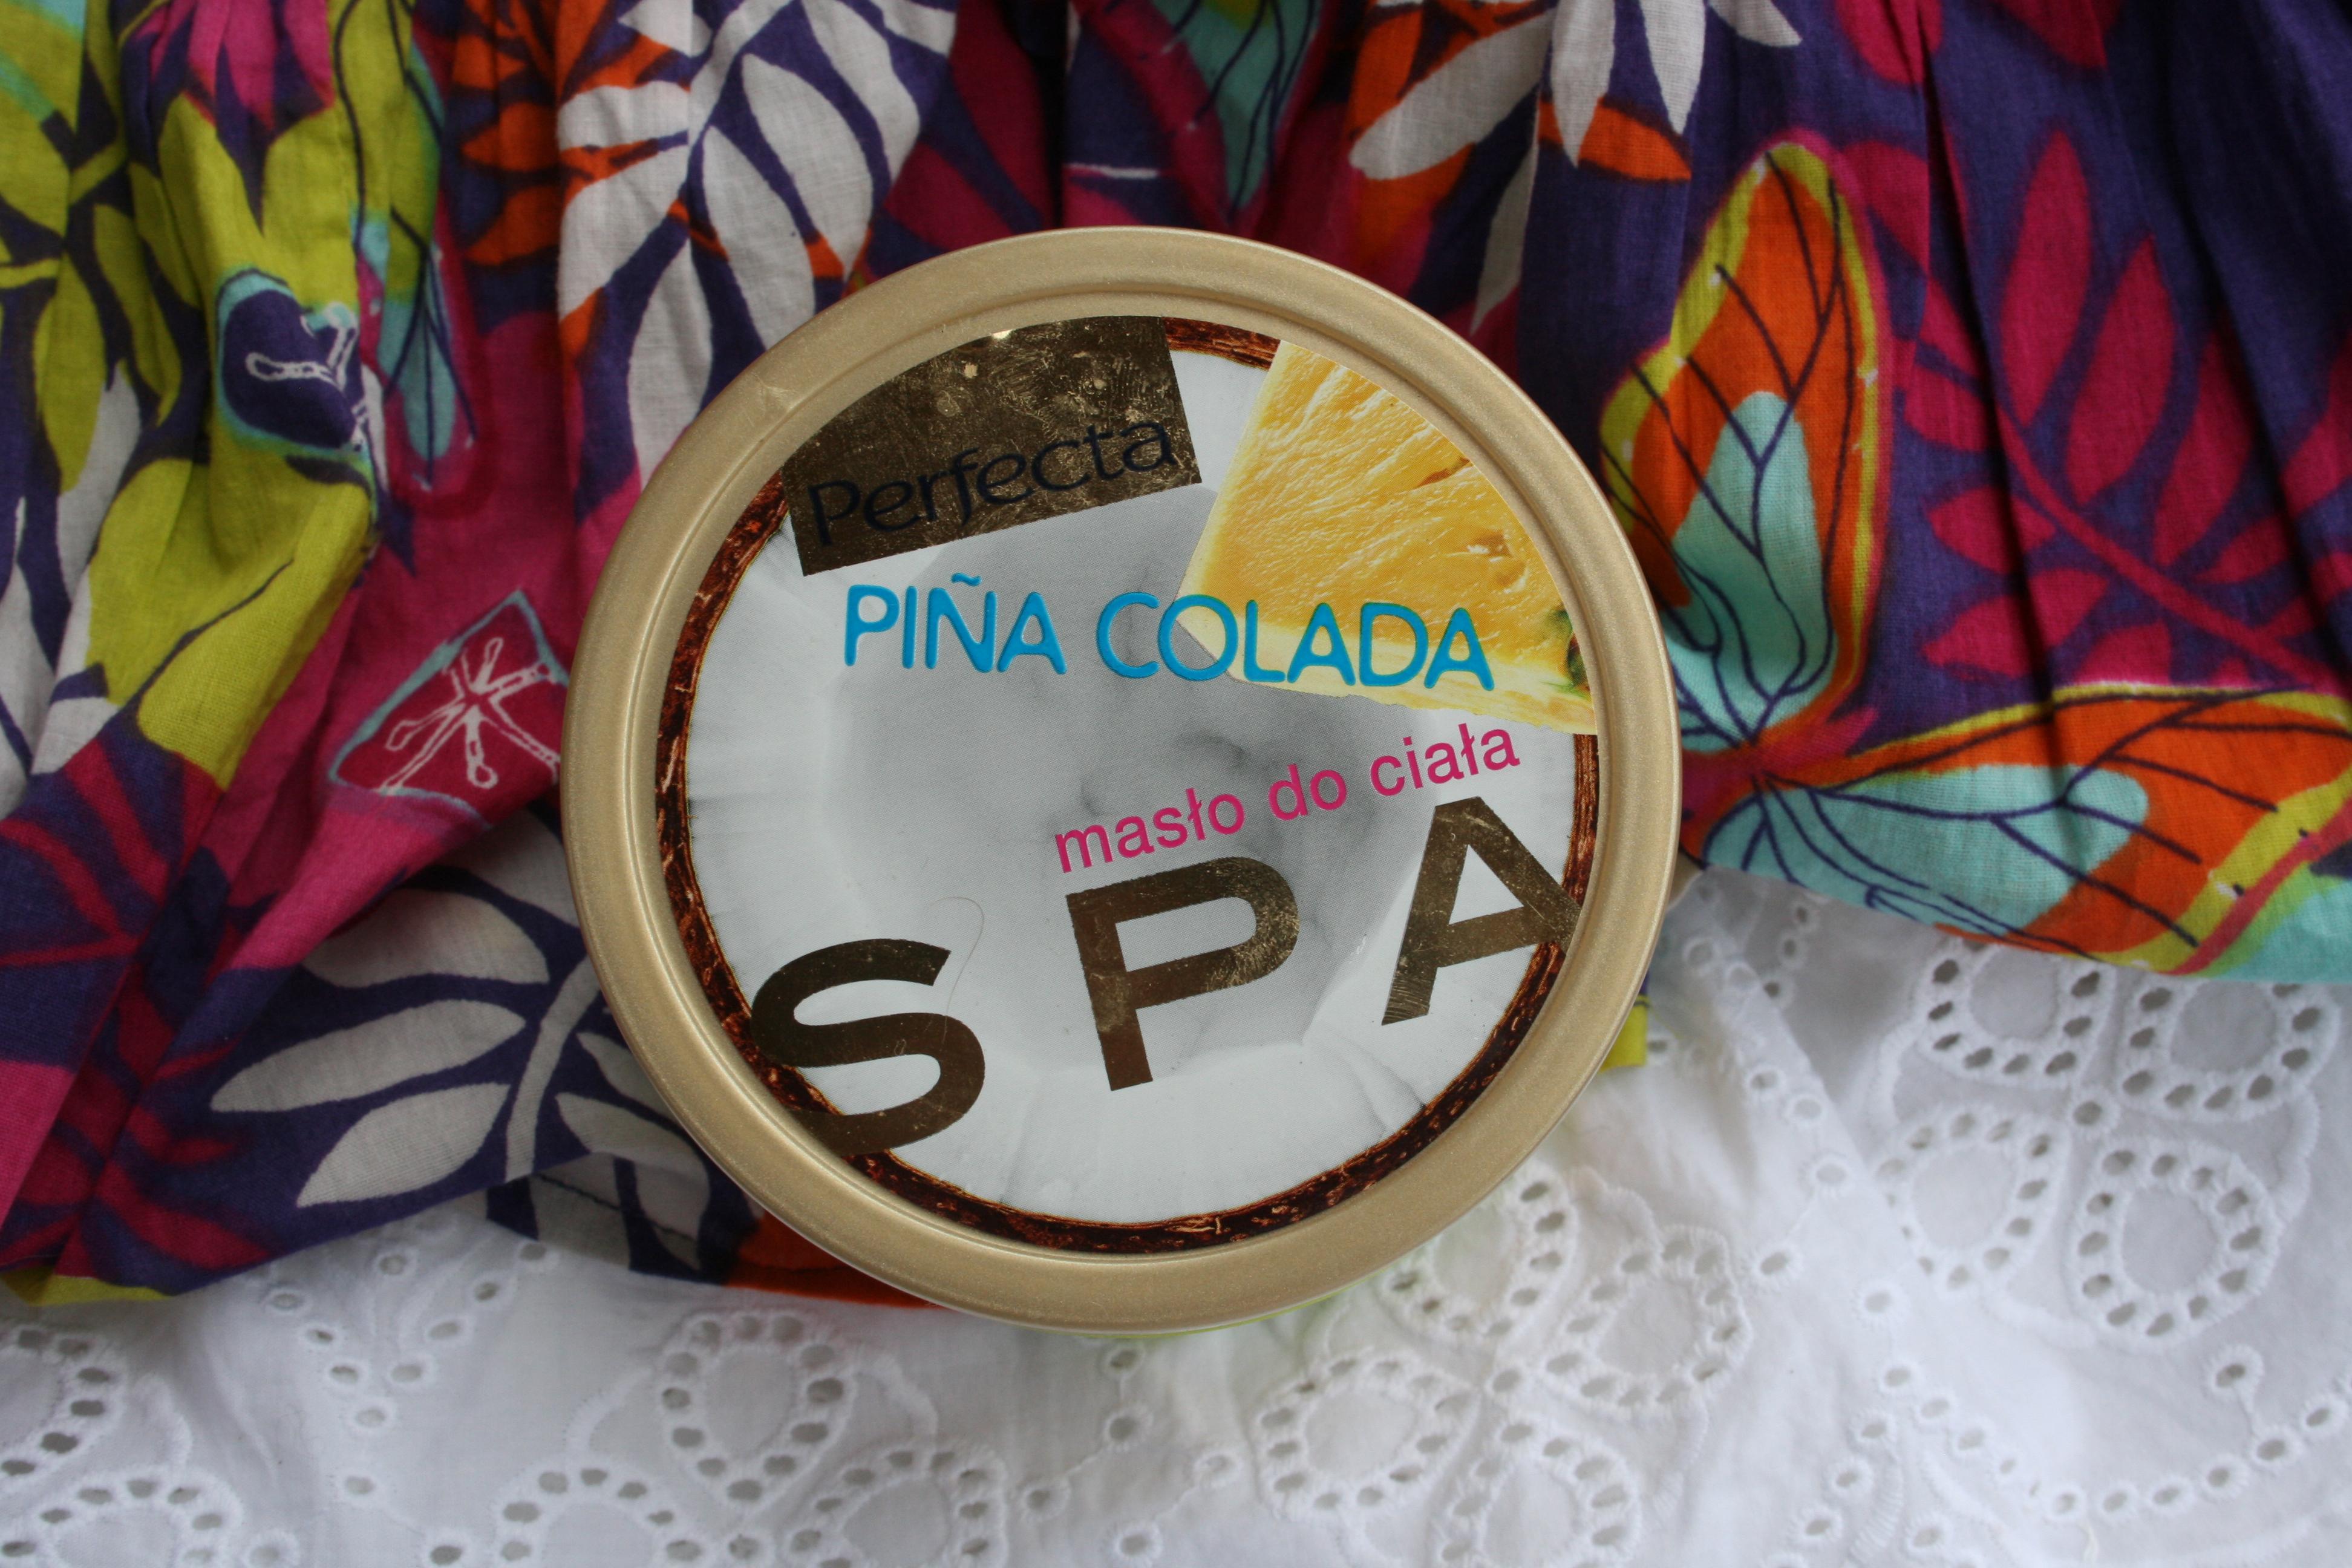 Masło do ciała Pina Colada Perfecta,